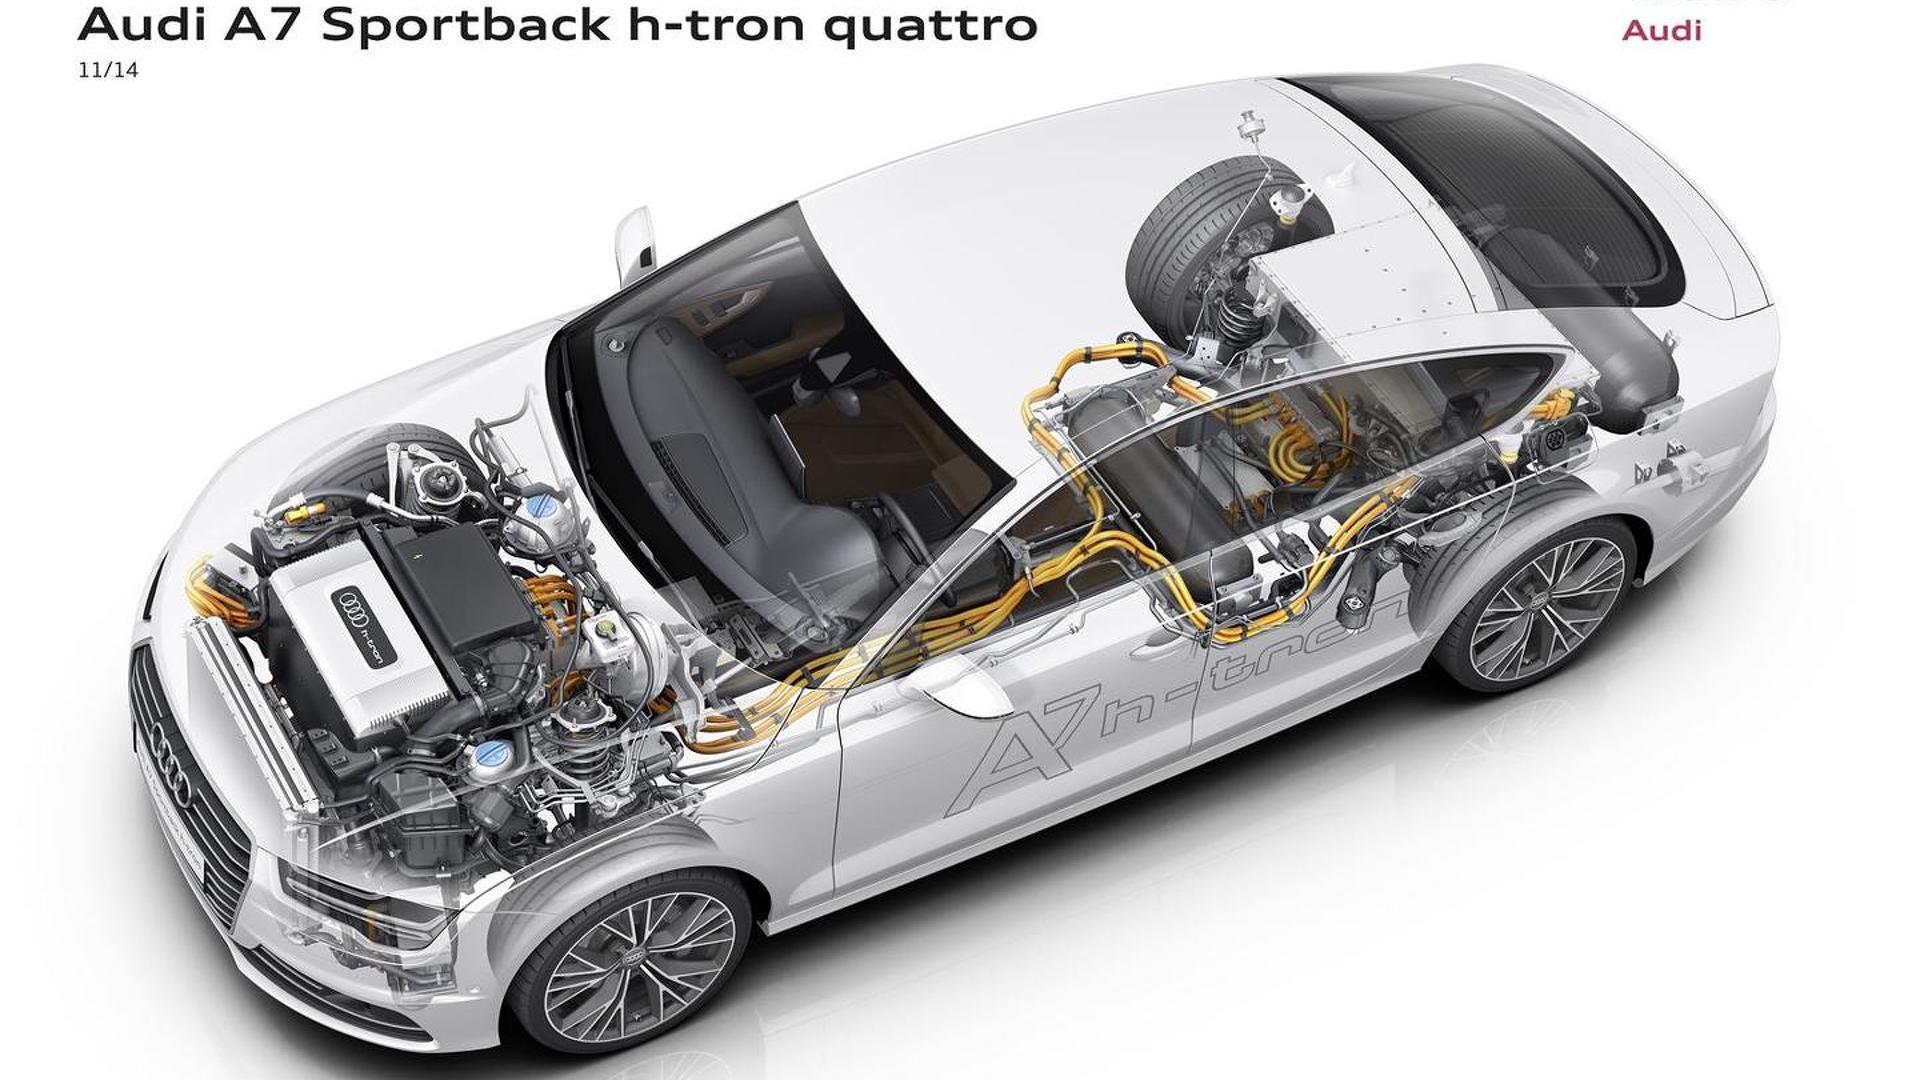 Водородная установка Audi A7 Sportback h-tron quattro